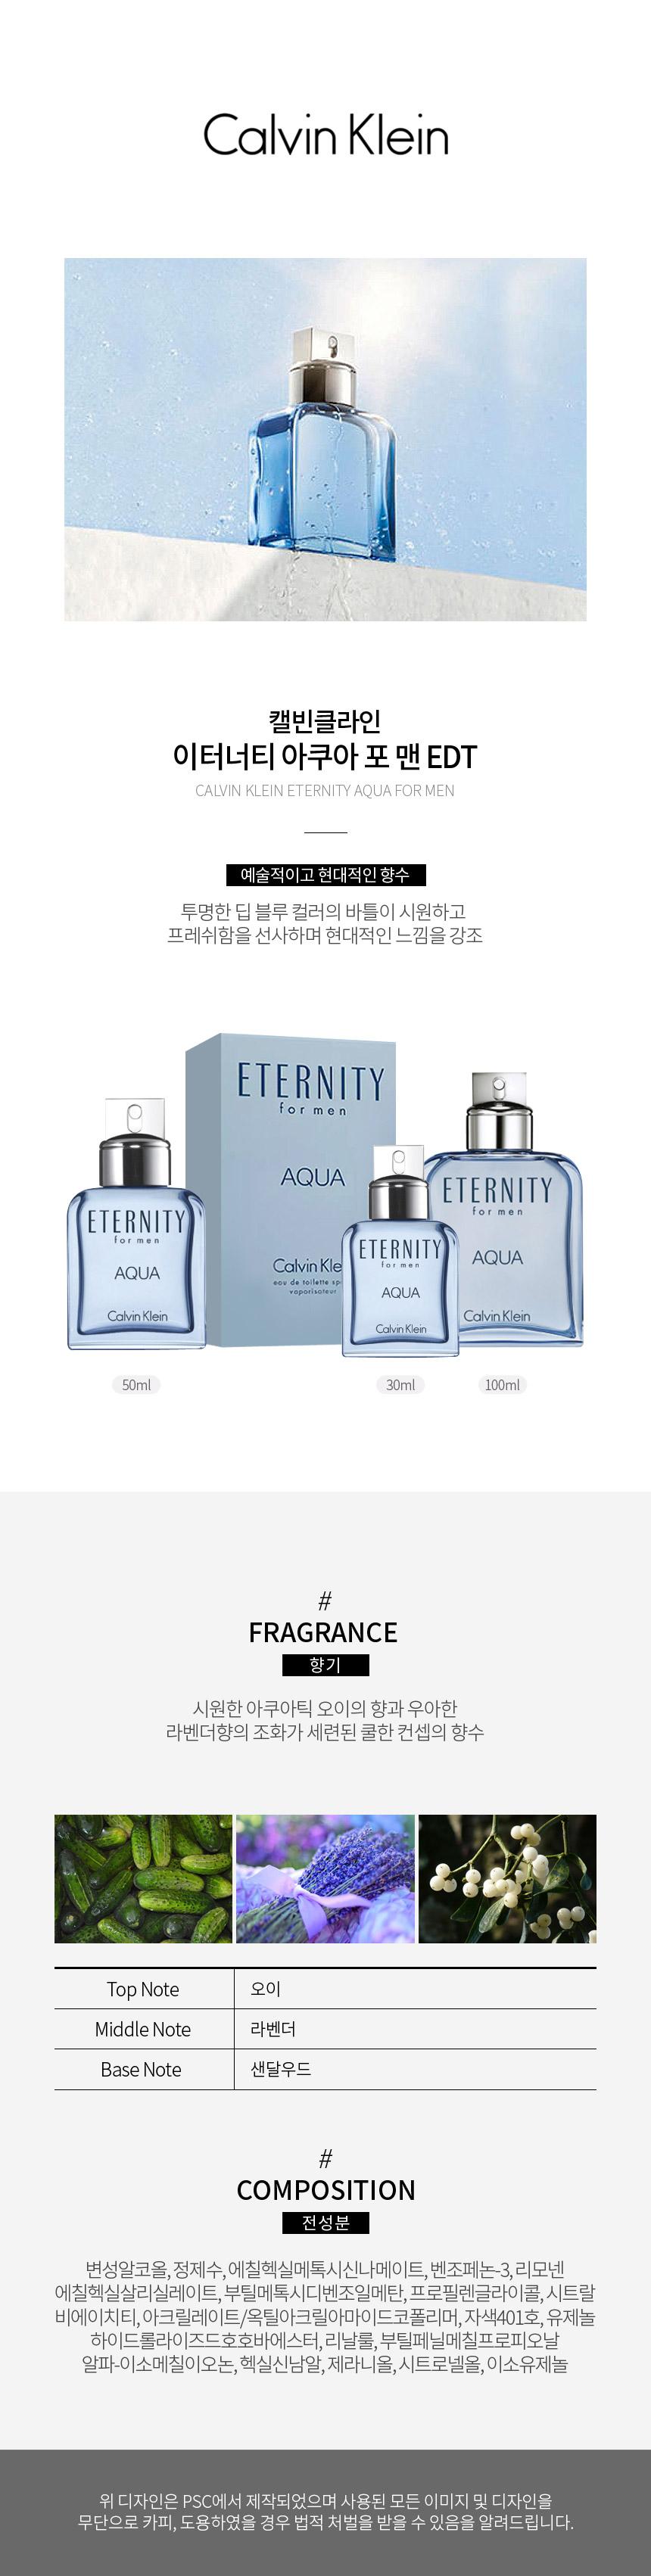 calvinklein_eternity_aquamen_page.jpg